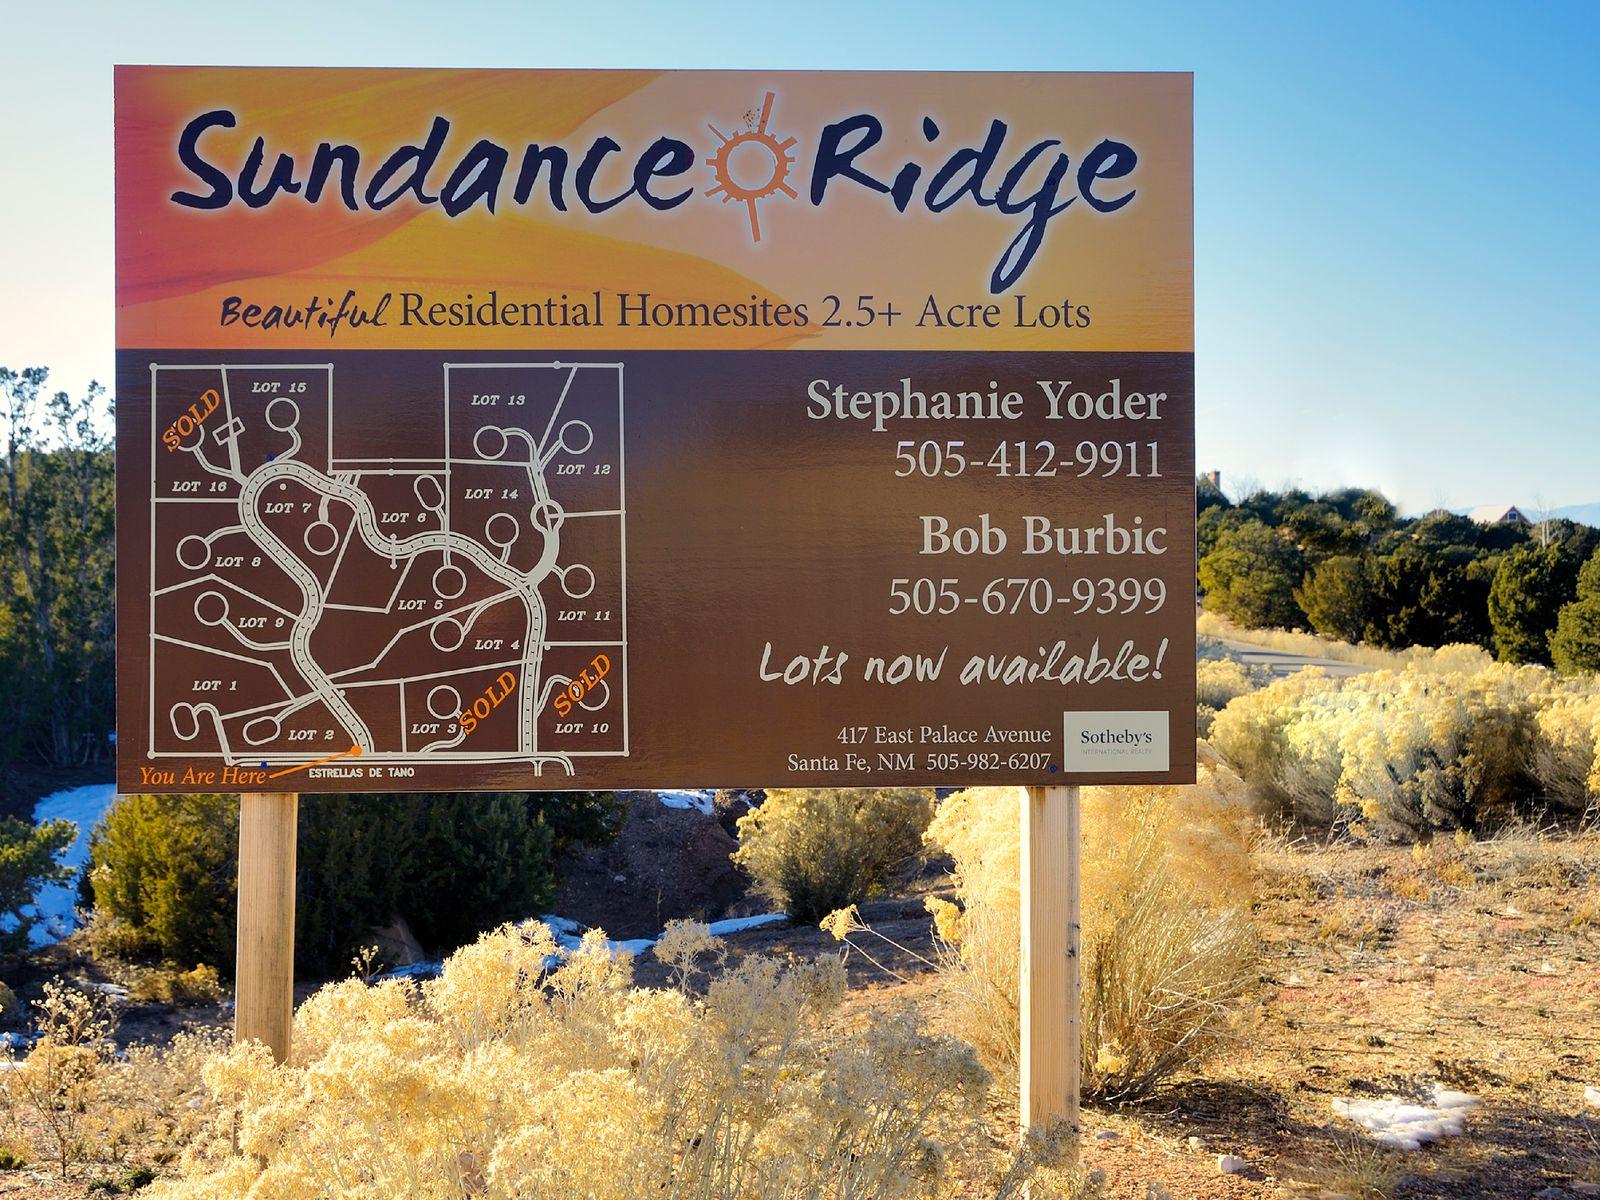 9 Sundance Ridge Lot 9